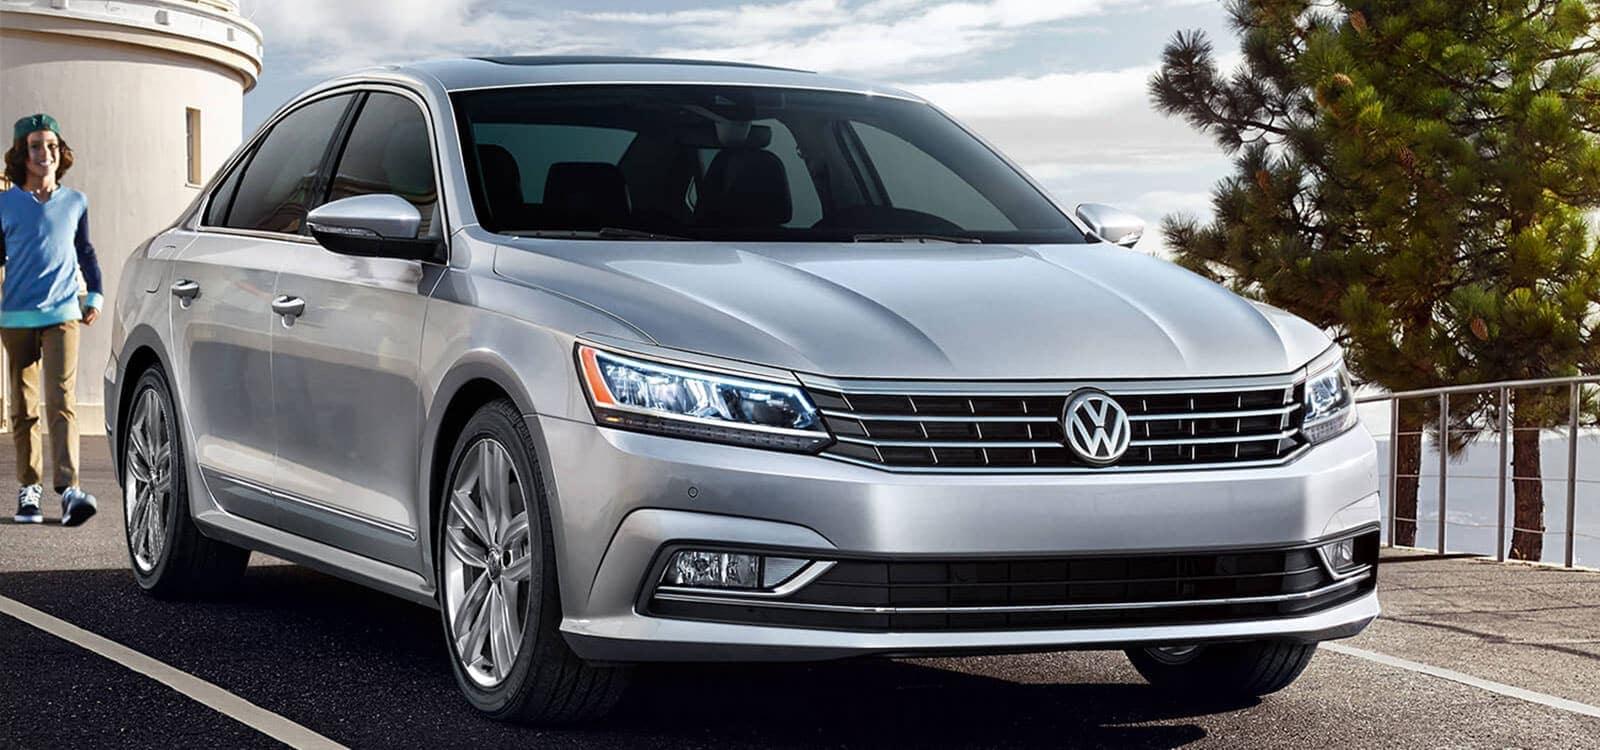 New Passat VW